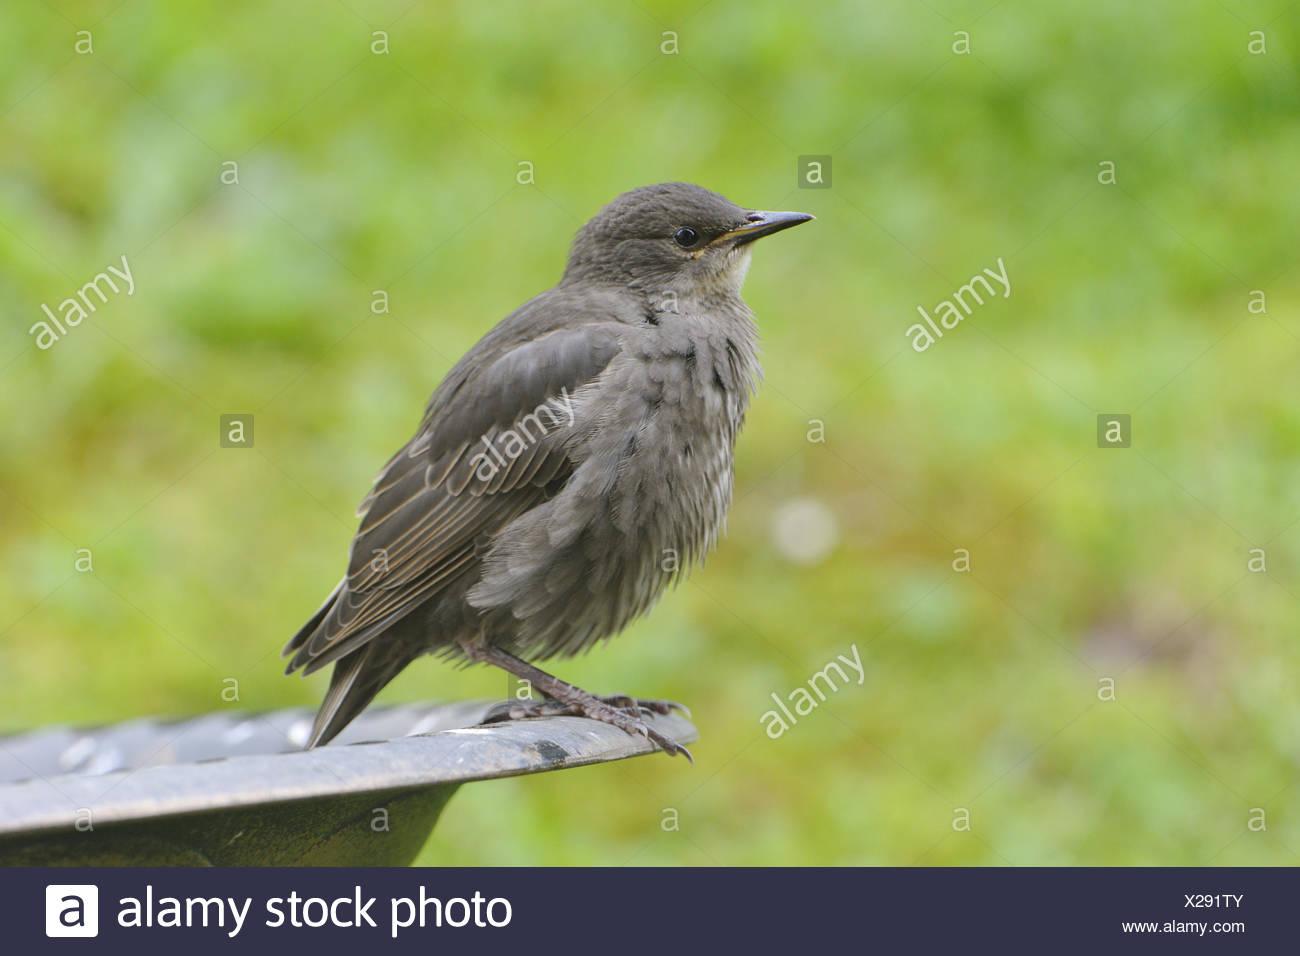 Common starling Stock Photo